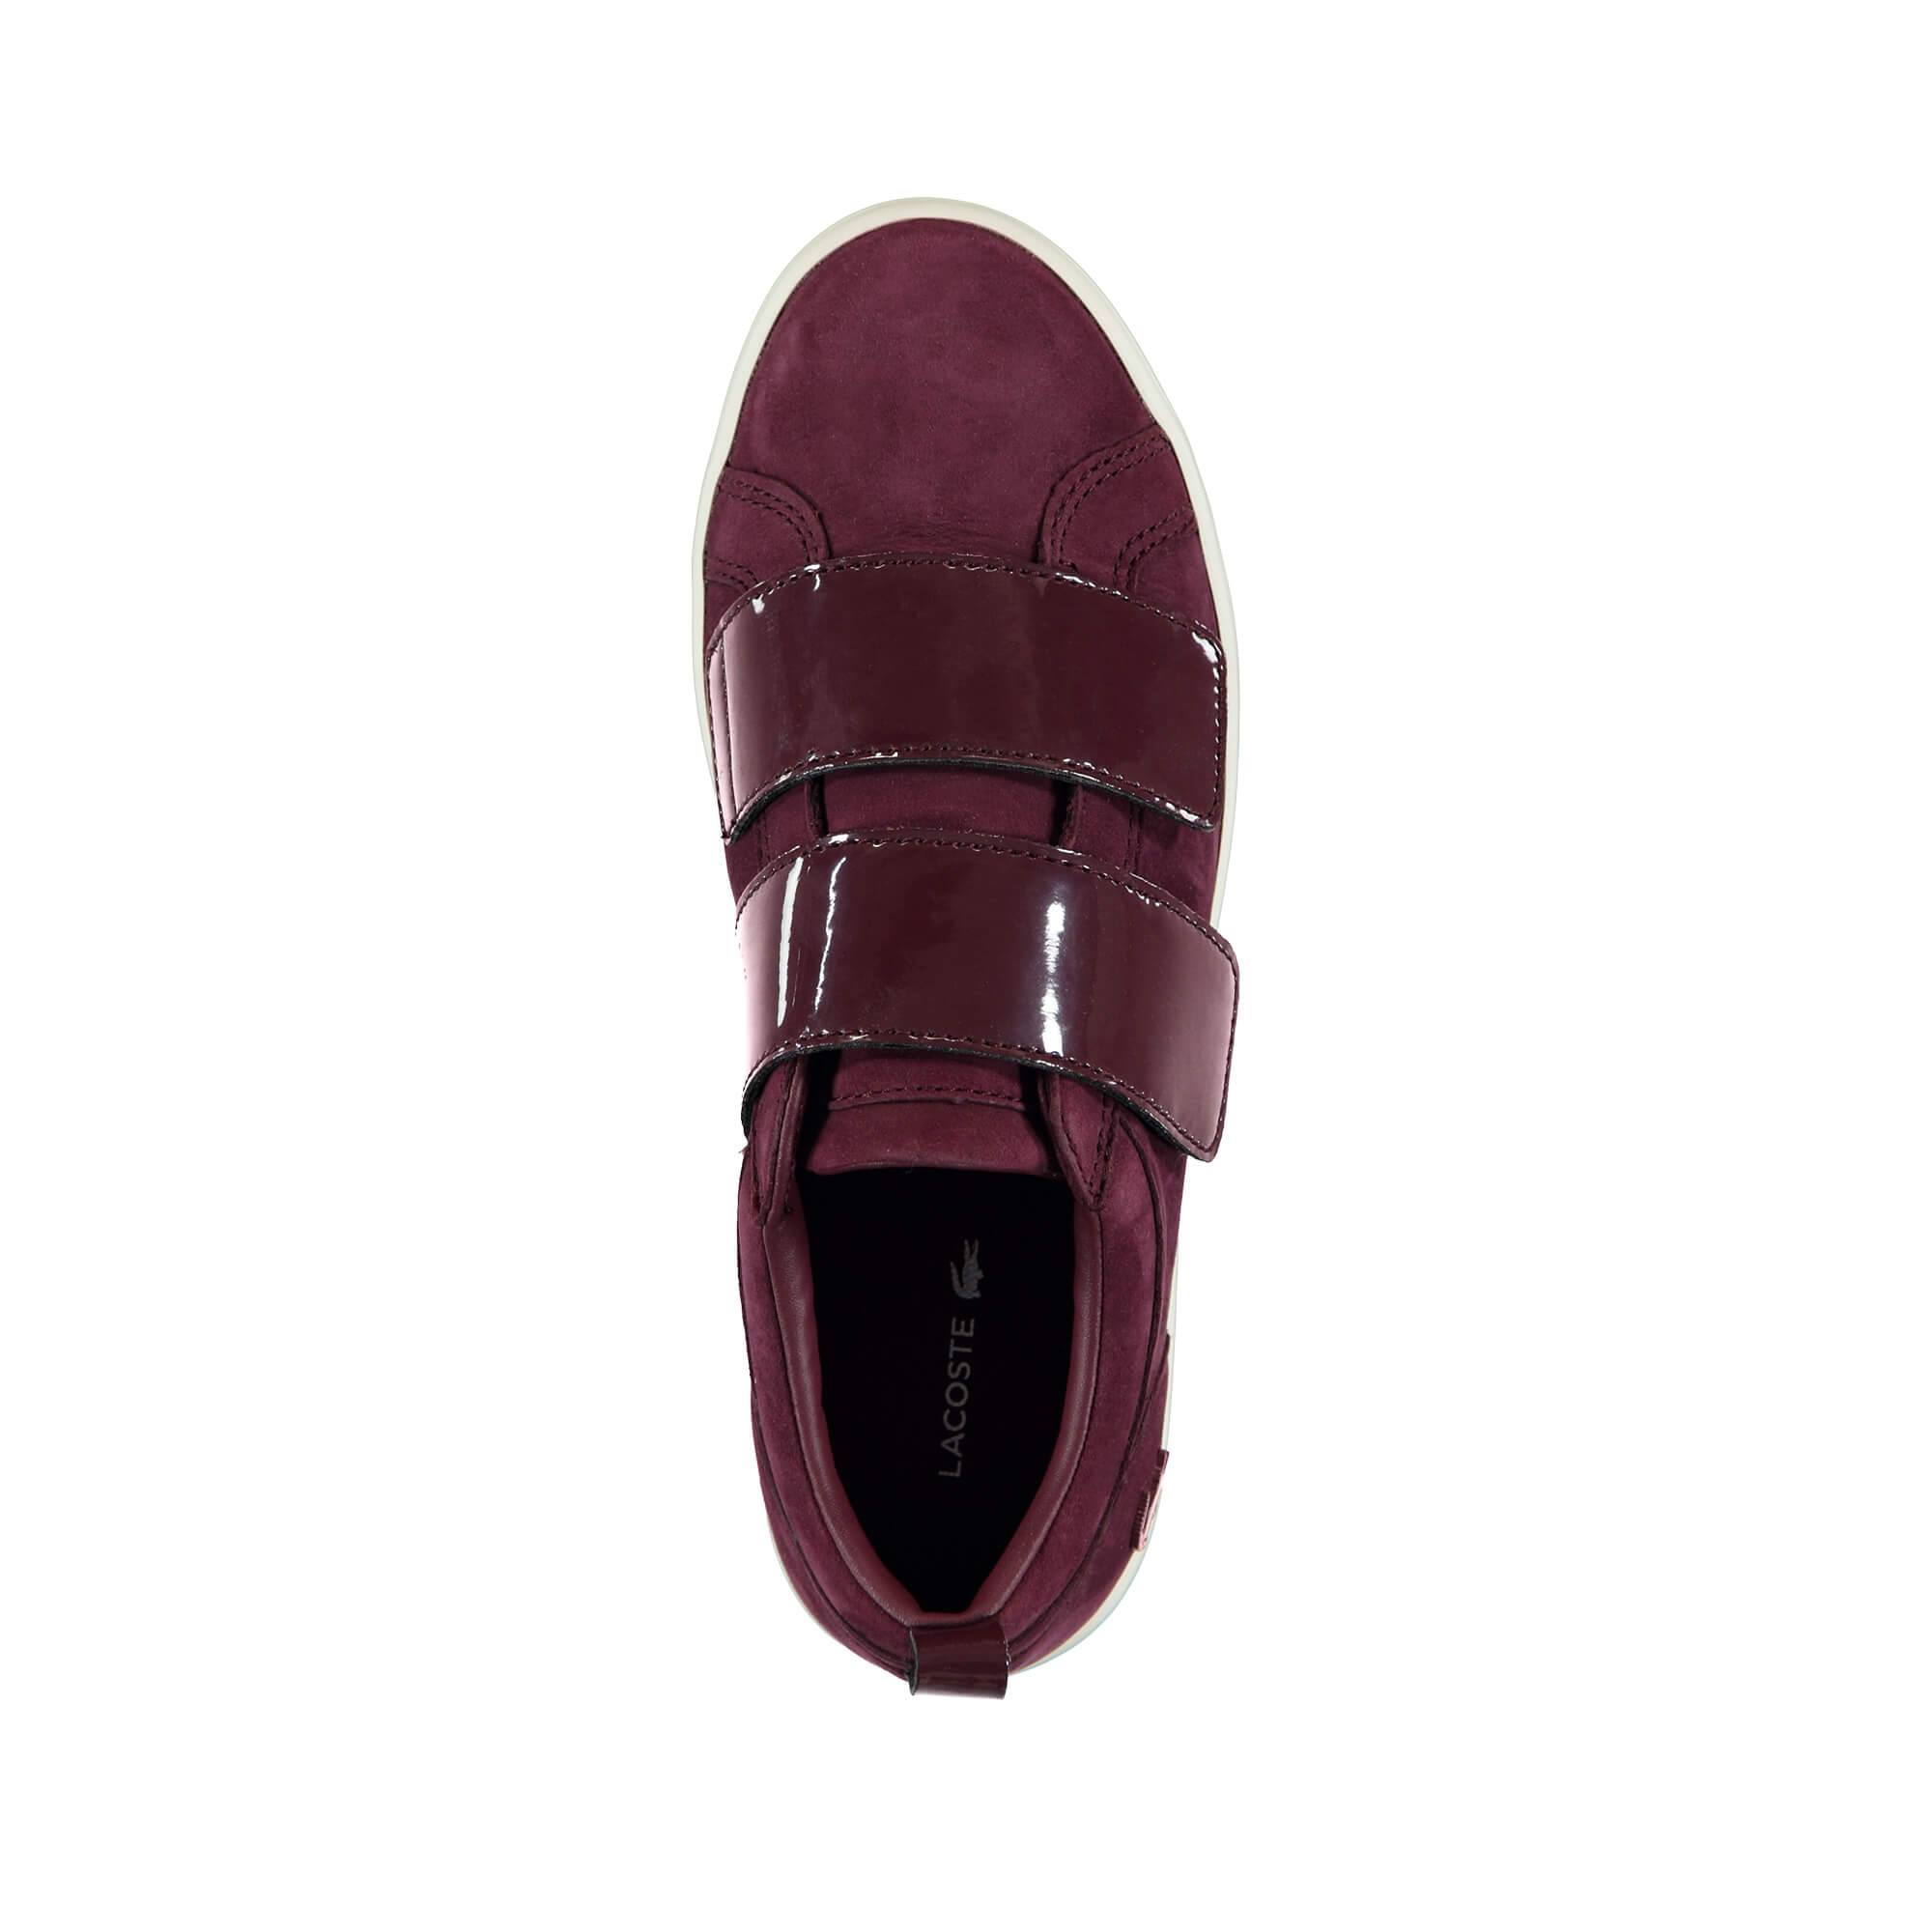 Lacoste кросівки жіночі Straightset Strap